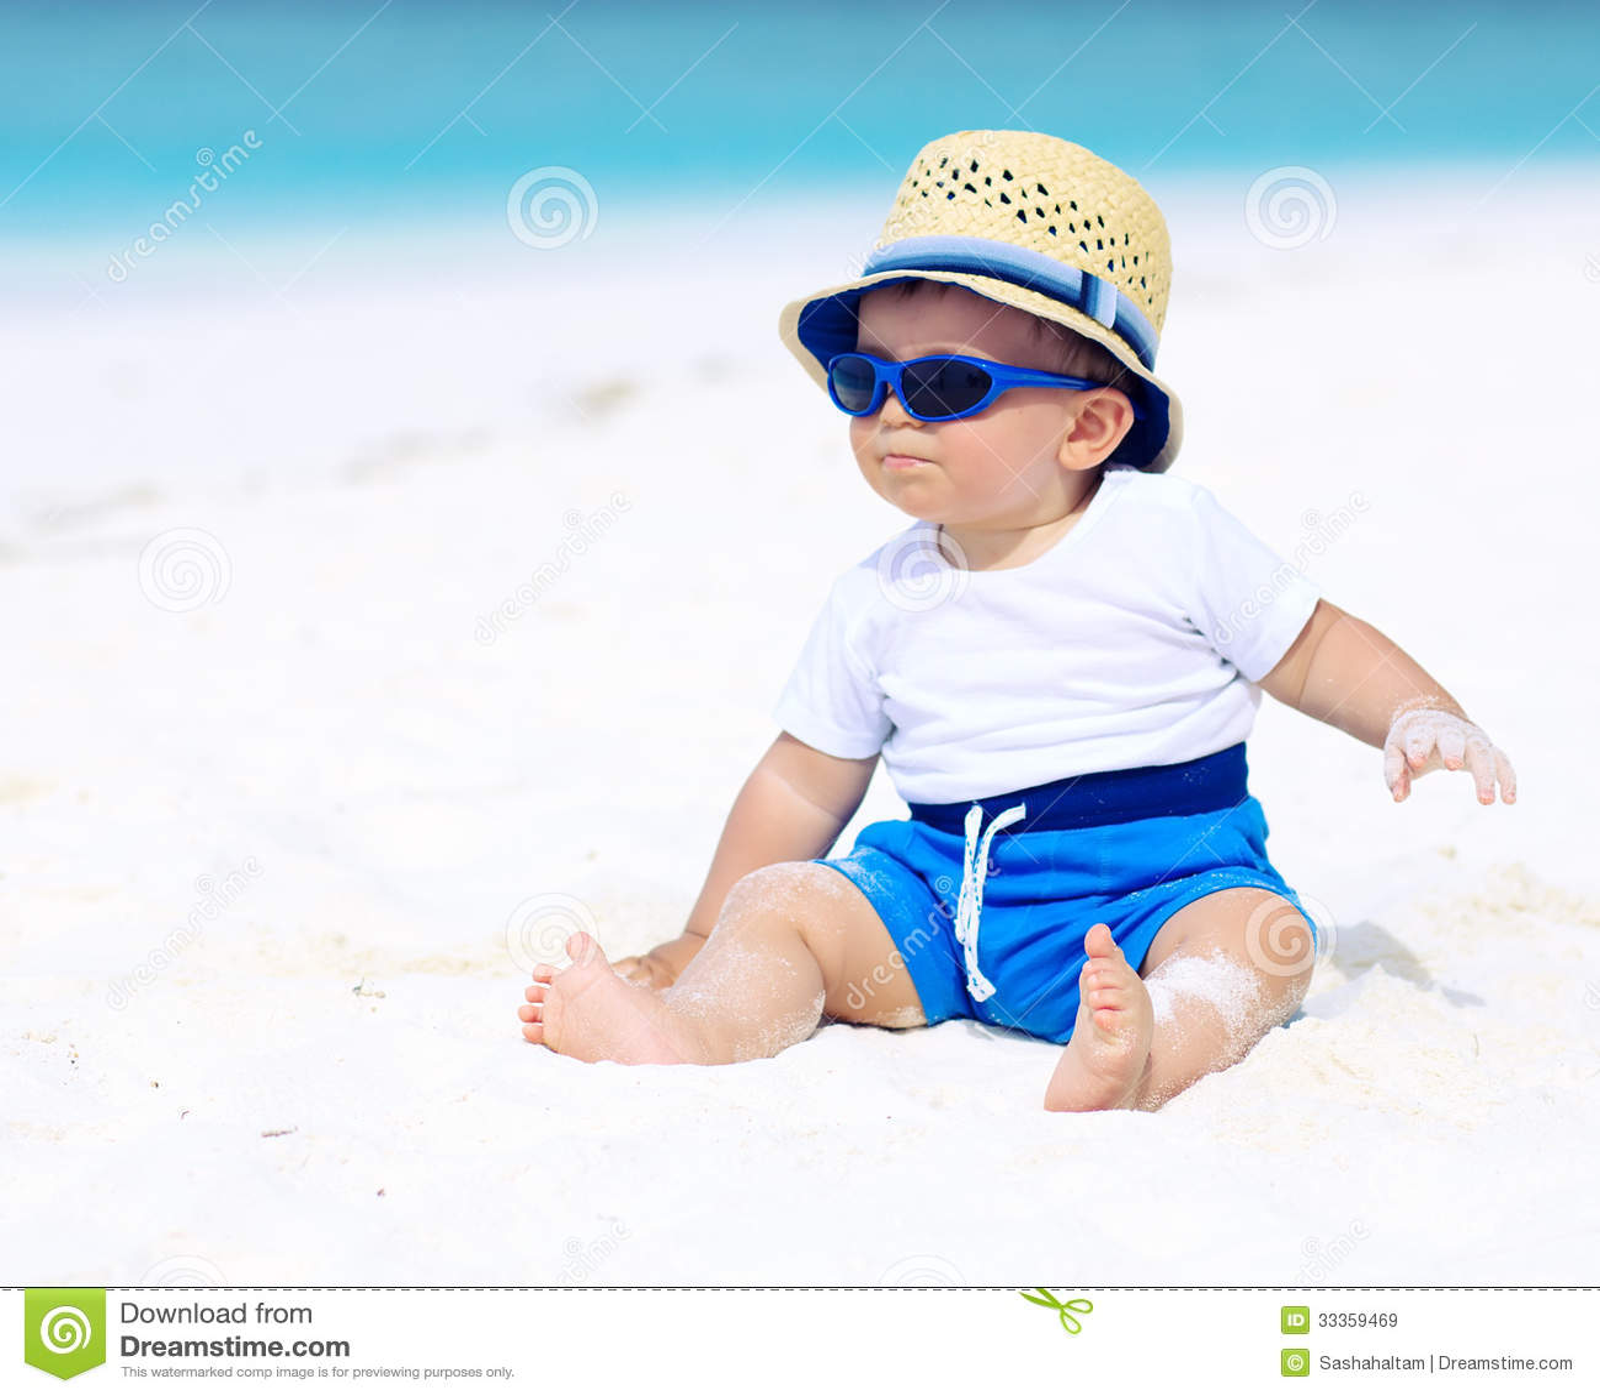 baby sunglasses 68et  baby sunglasses